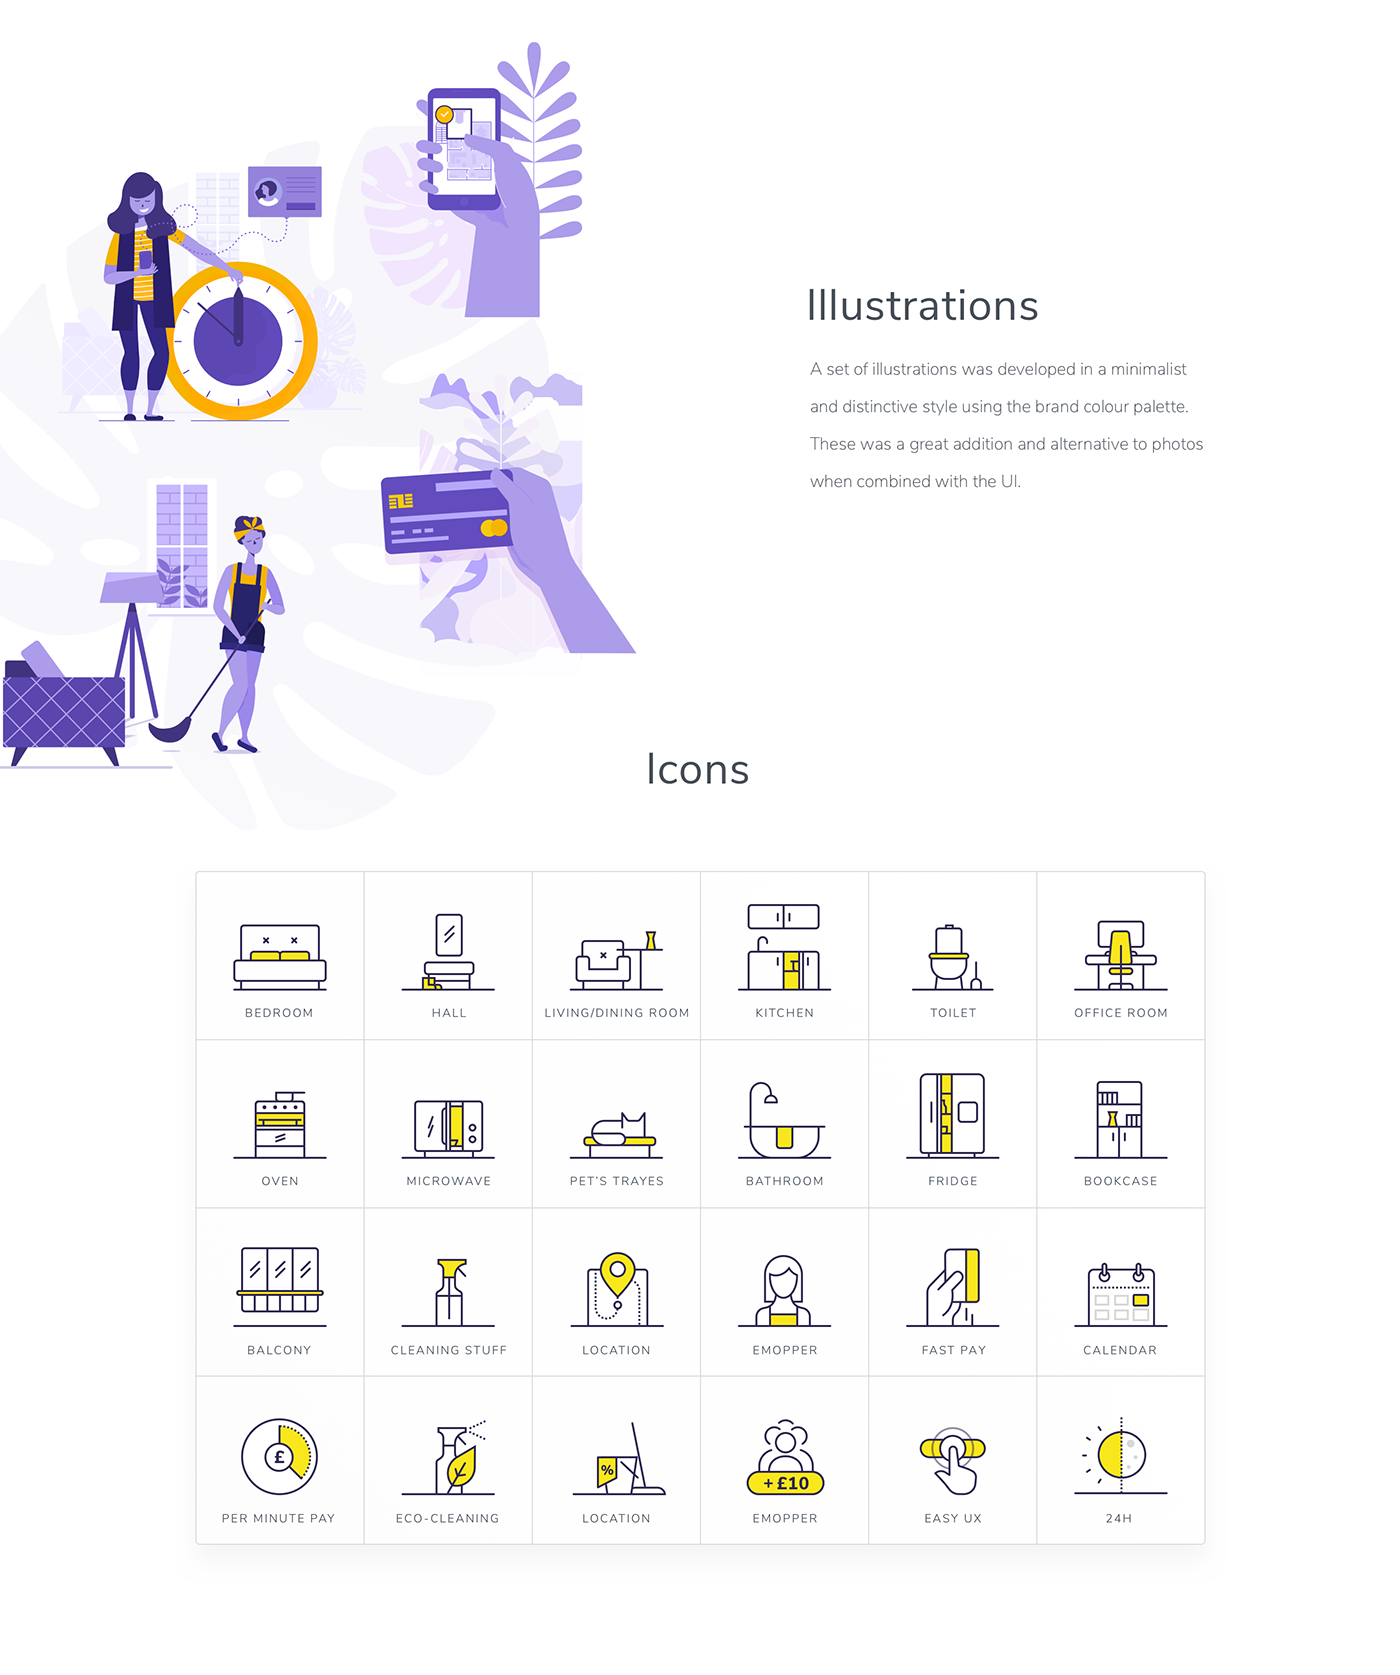 #graphicDesign #Design #UI/UX  #behance #Logo #AppDesign  #inspiration #webdesign #startup #illustration